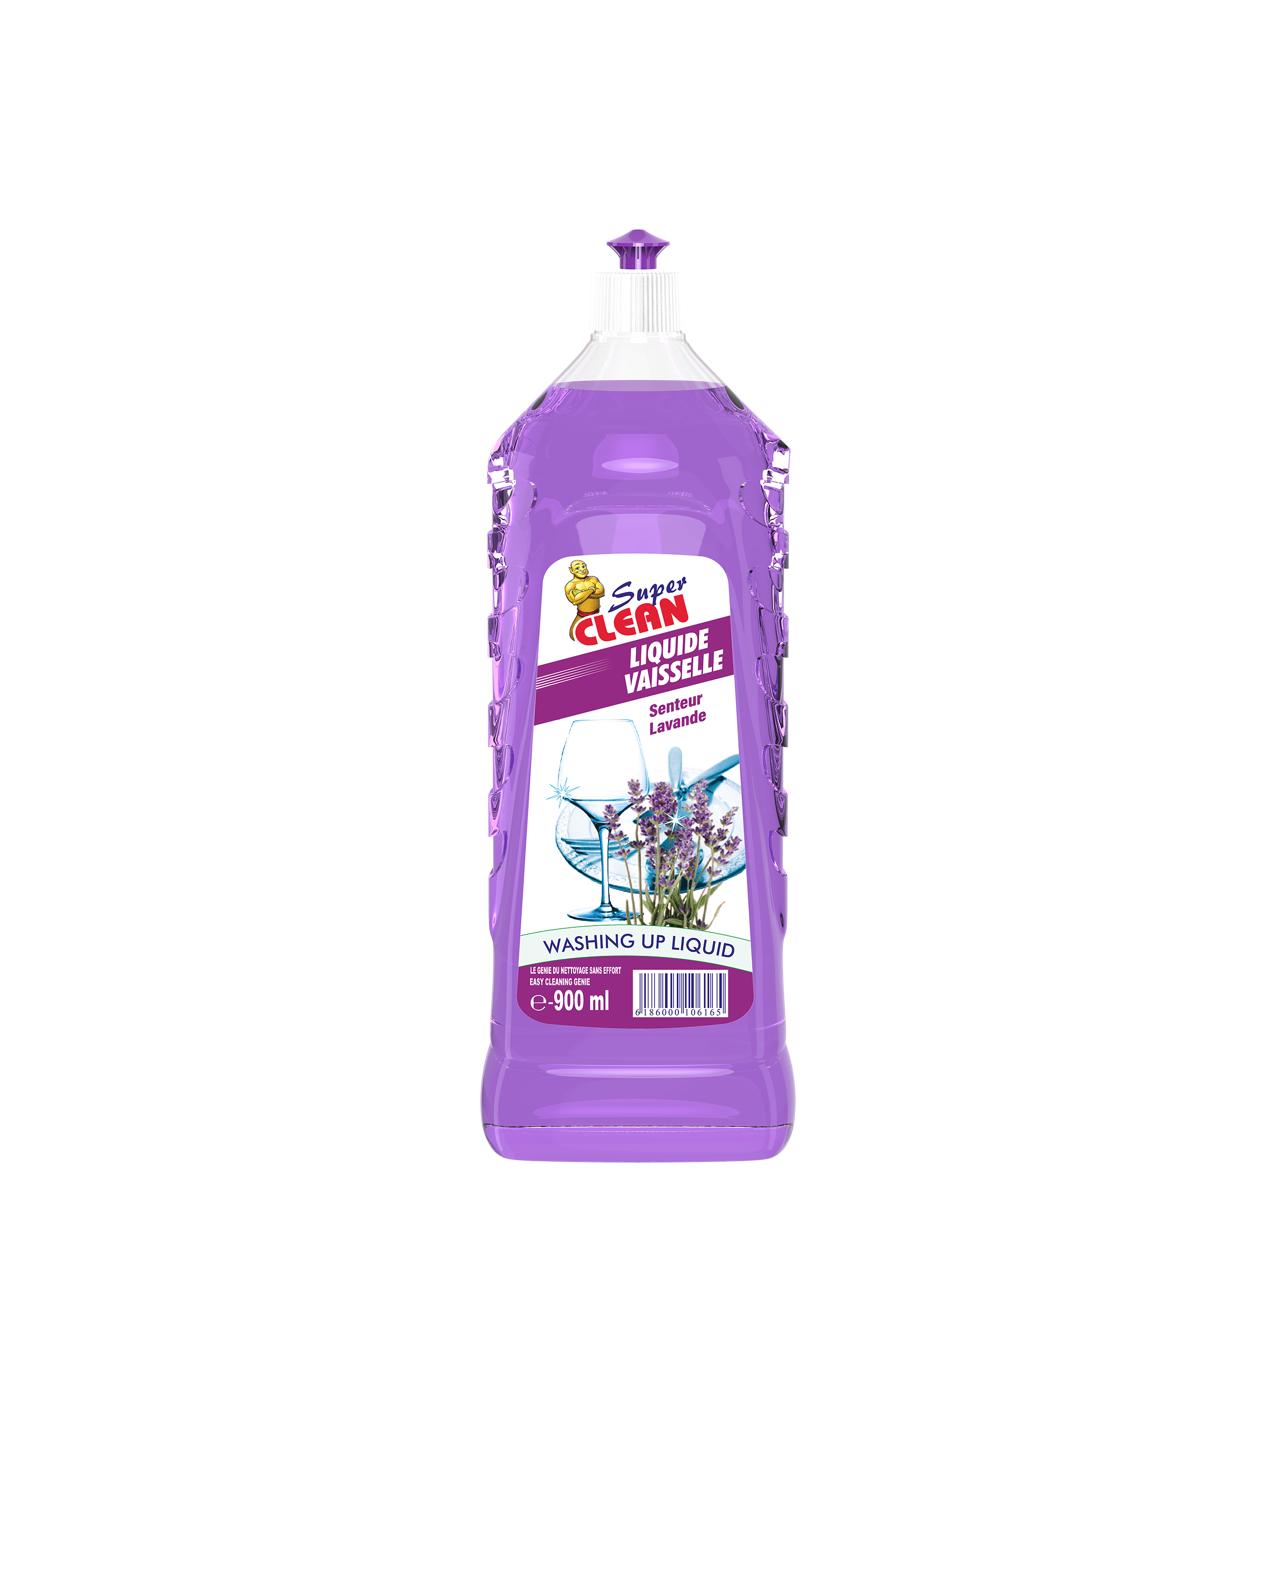 SUPER CLEAN_Liquide Vaisselle Lavande 900ml_Siprochim